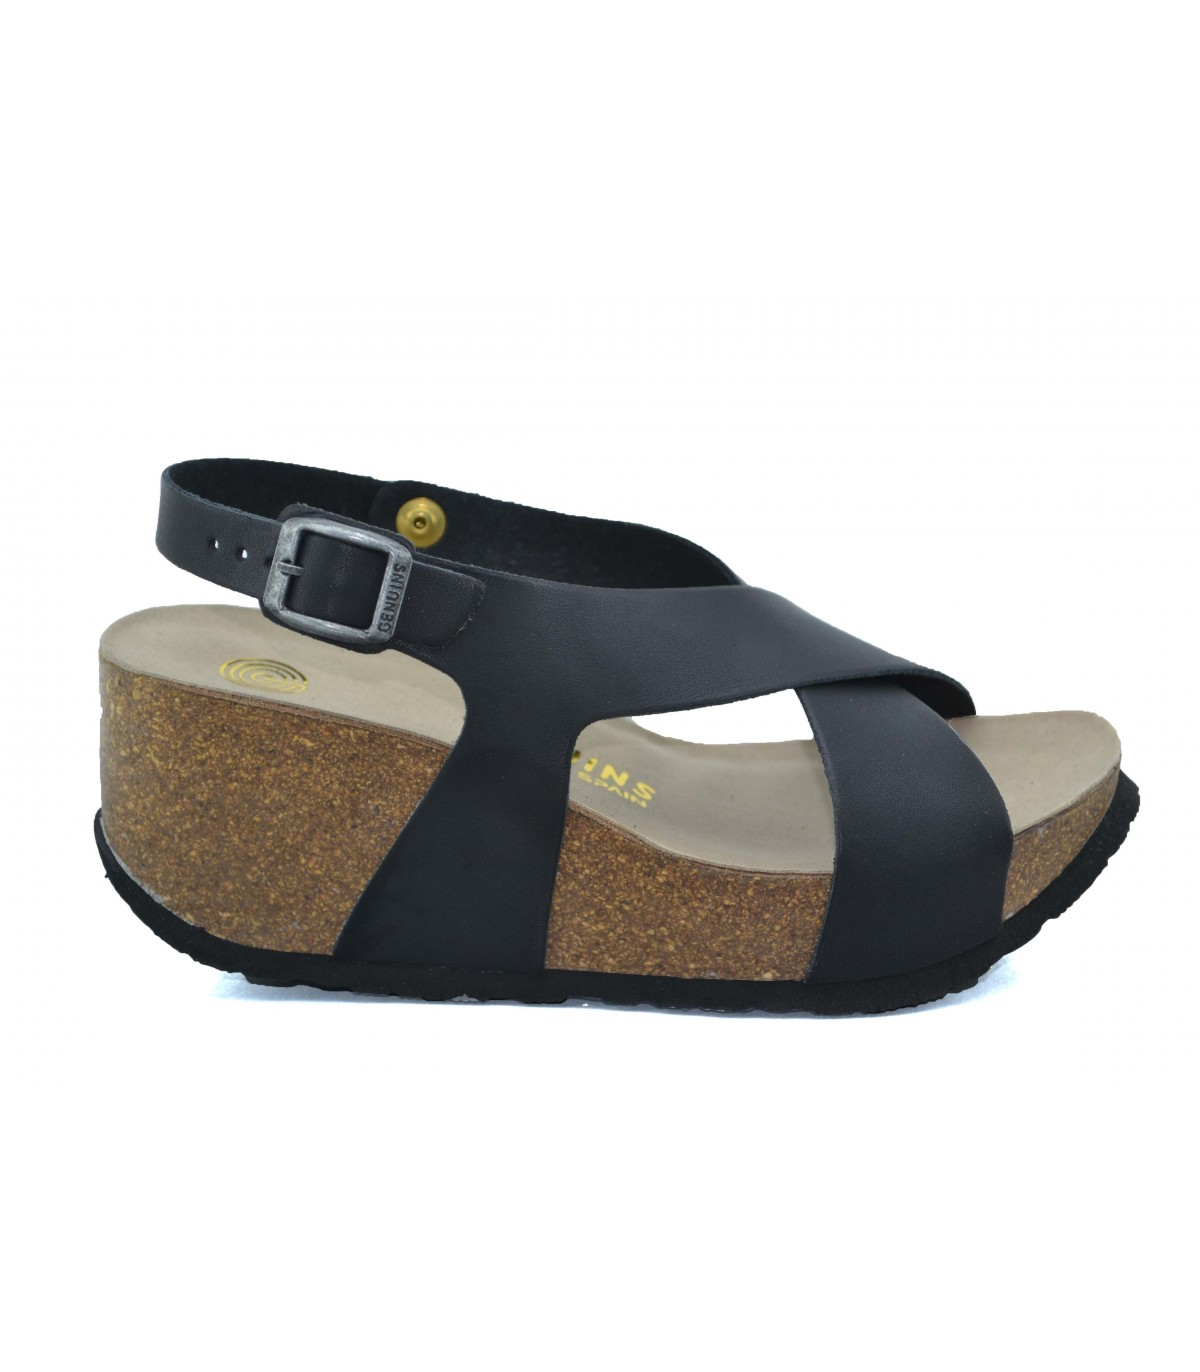 f3698240c71 Calzado Sandalias Online Mujer NizaZapatos Genuins tQChsBrdx